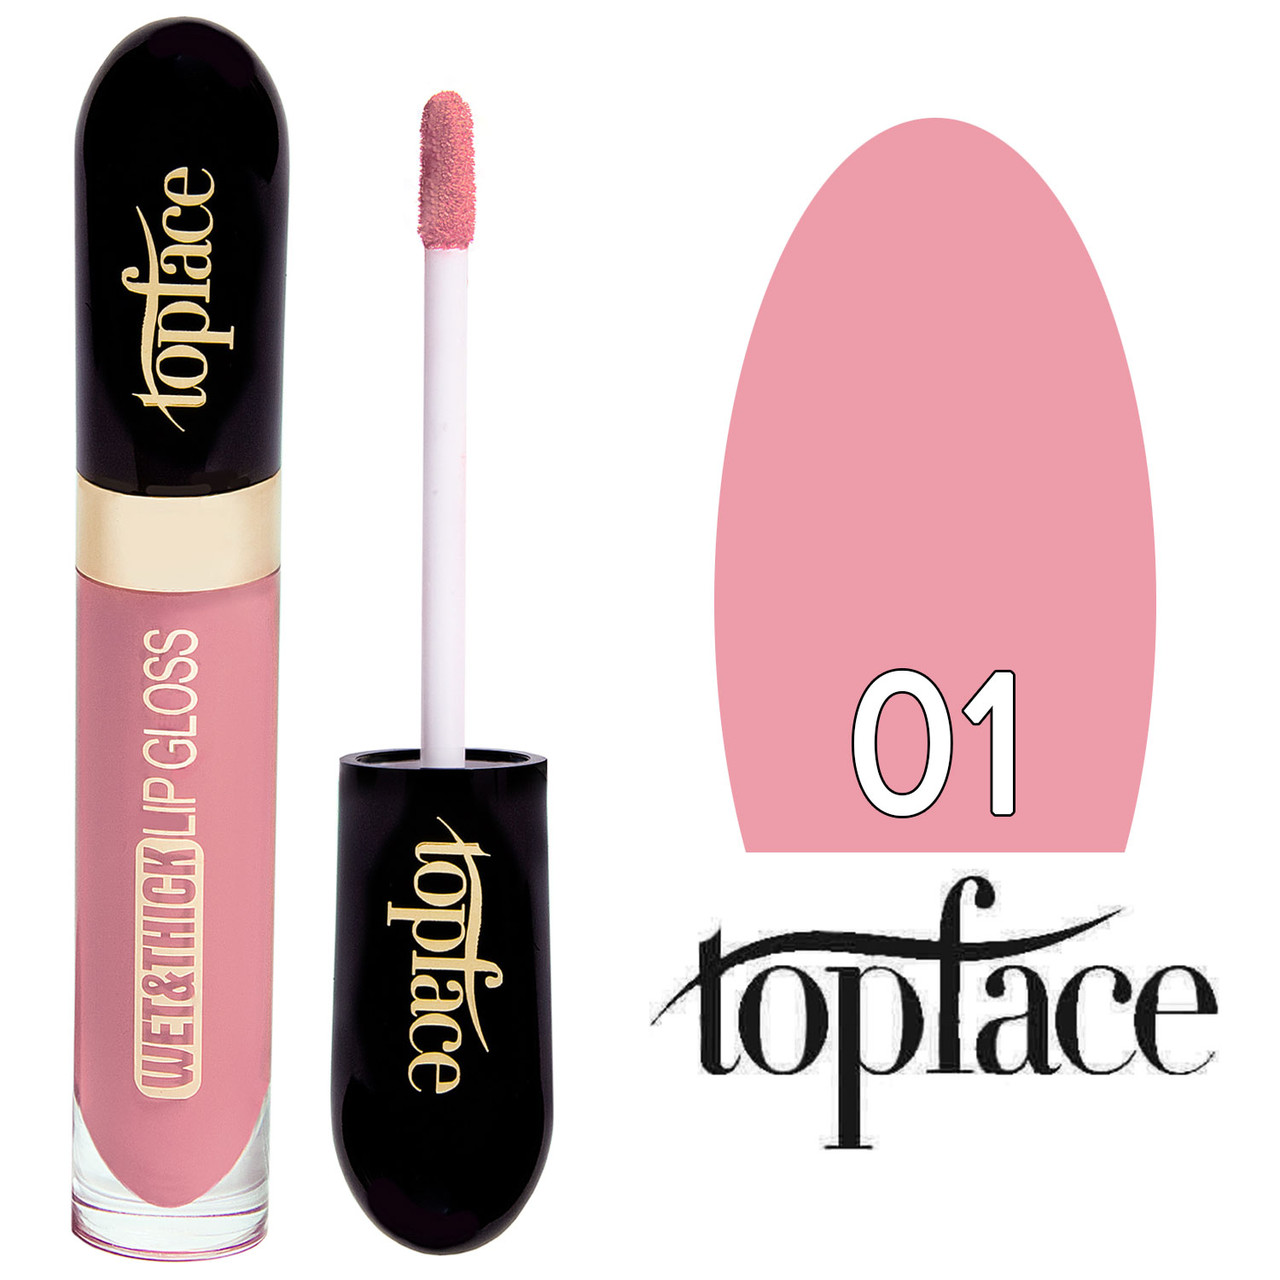 TopFace Блеск для губ Wet&Thick PT-202 Тон №01 pastel pink, матовый